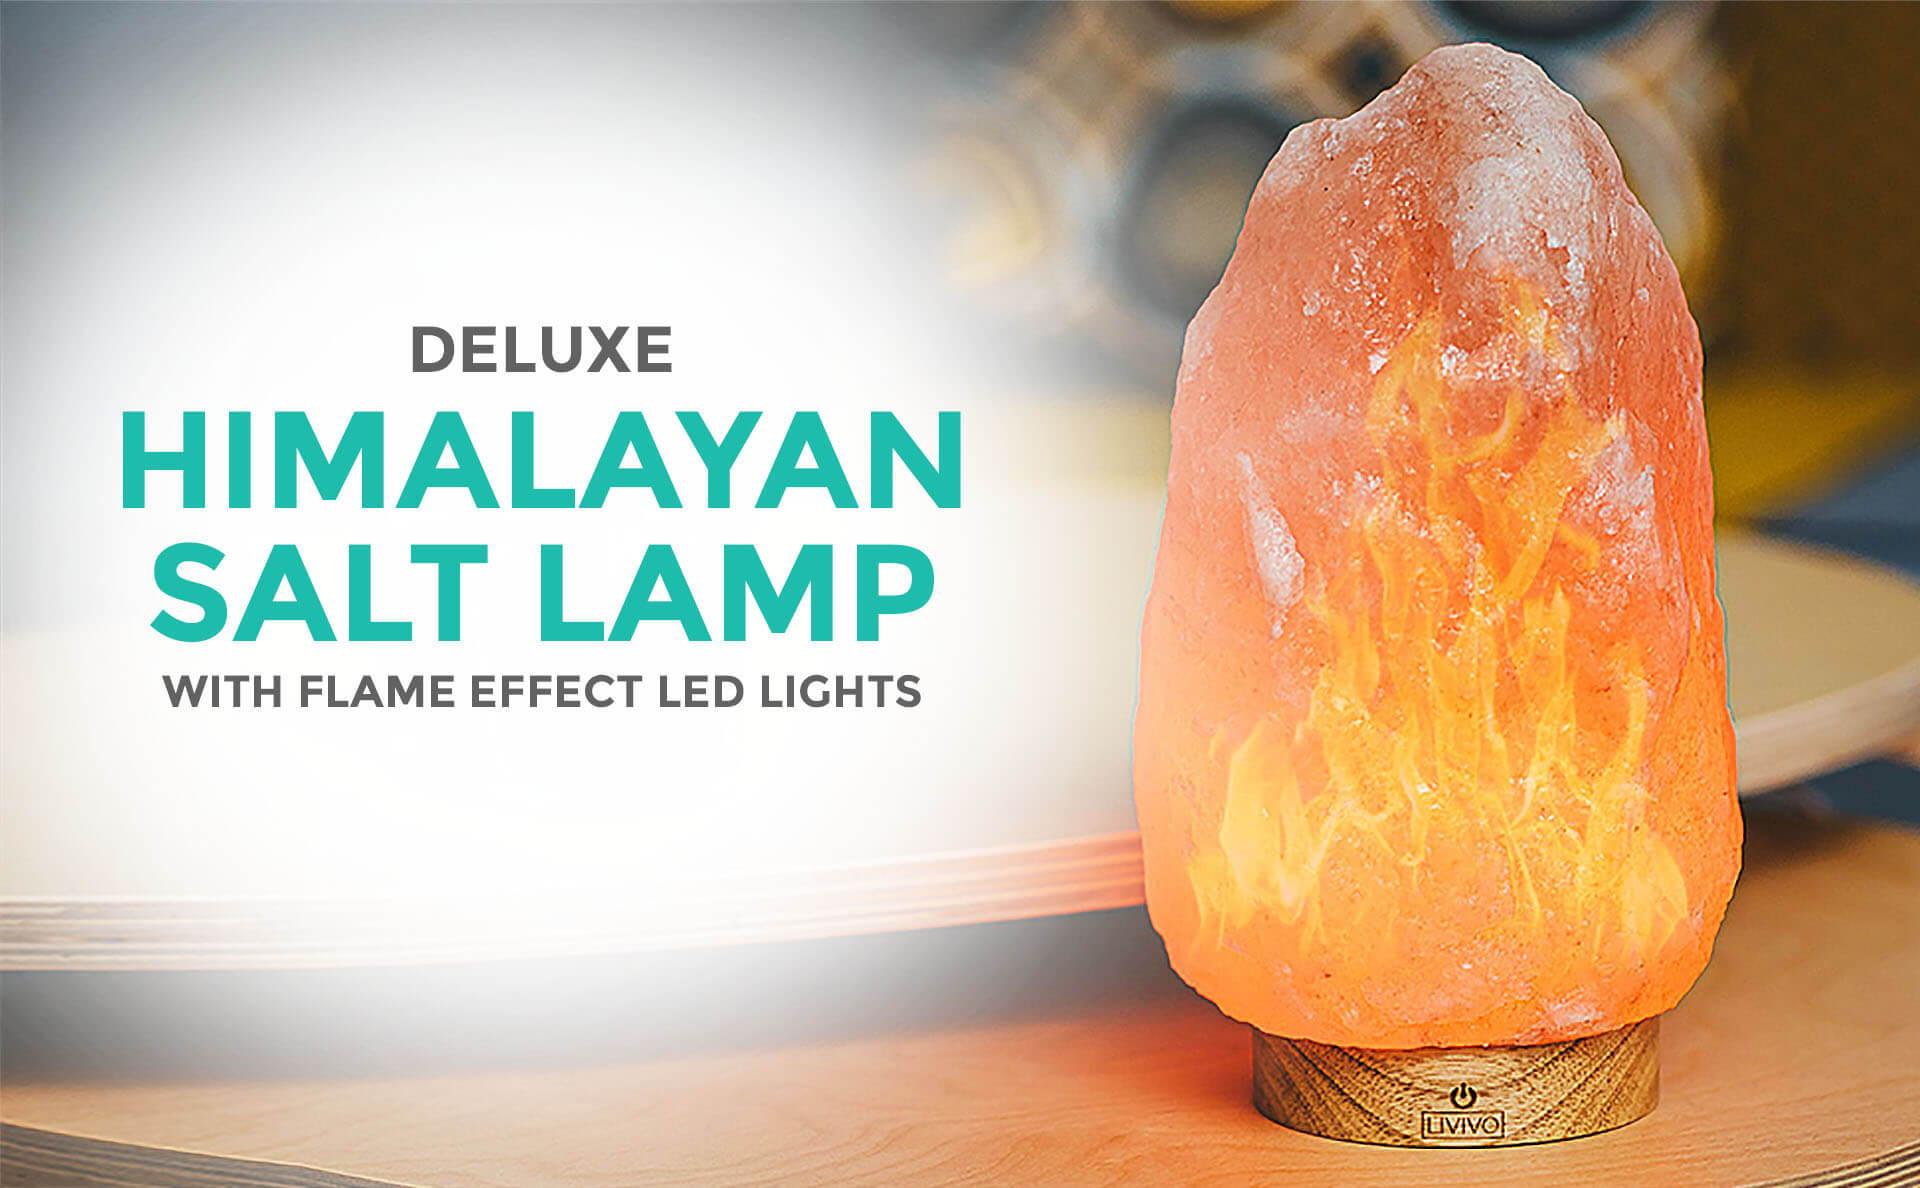 Deluxe Himalayan Salt Lamp